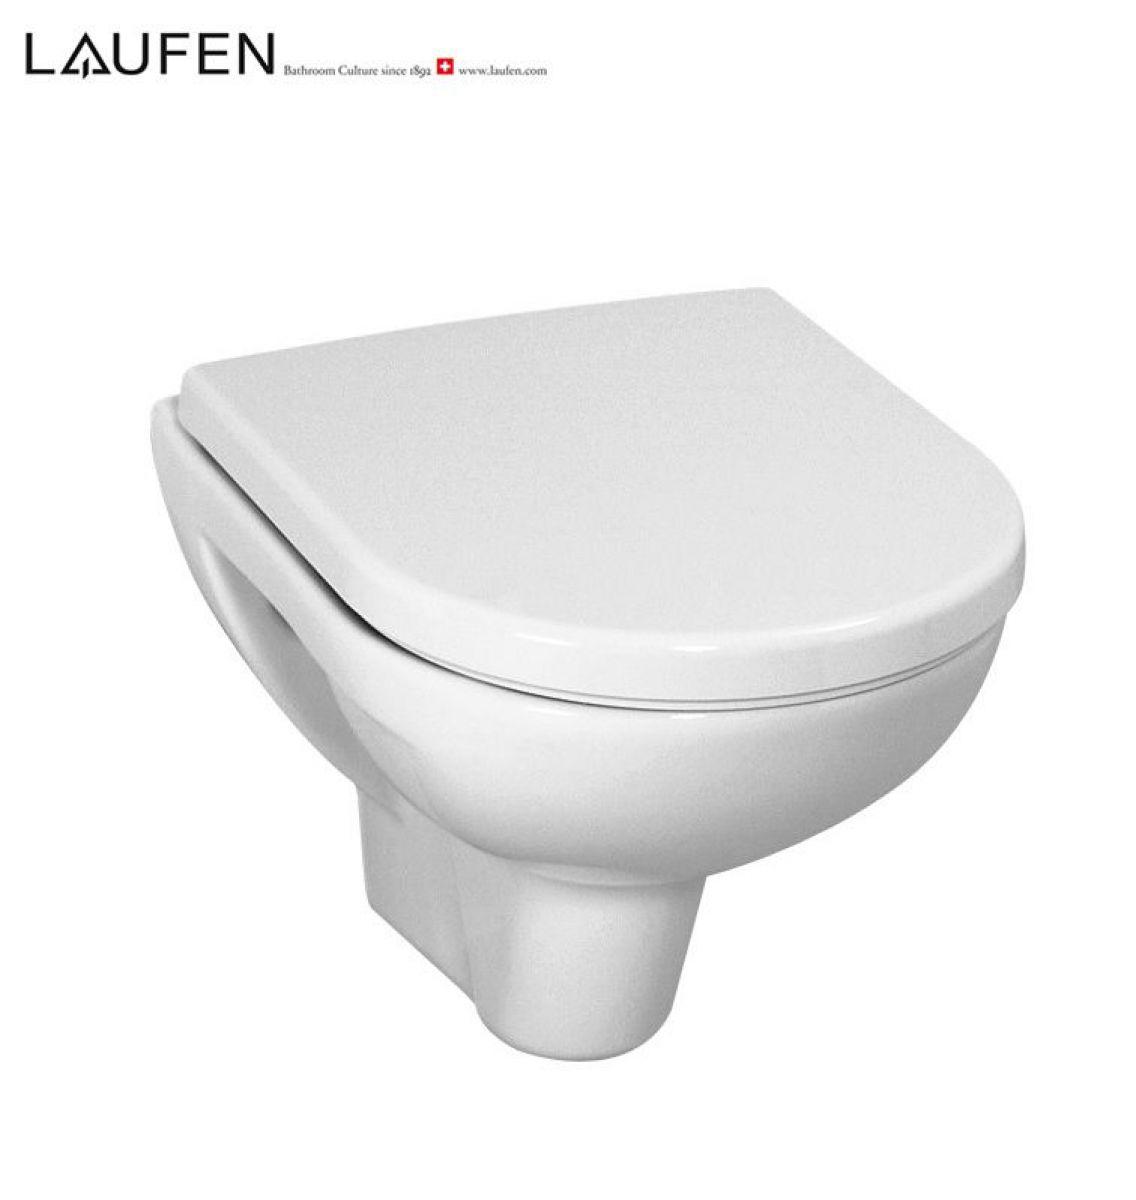 laufen pro wall hung toilet uk bathrooms. Black Bedroom Furniture Sets. Home Design Ideas